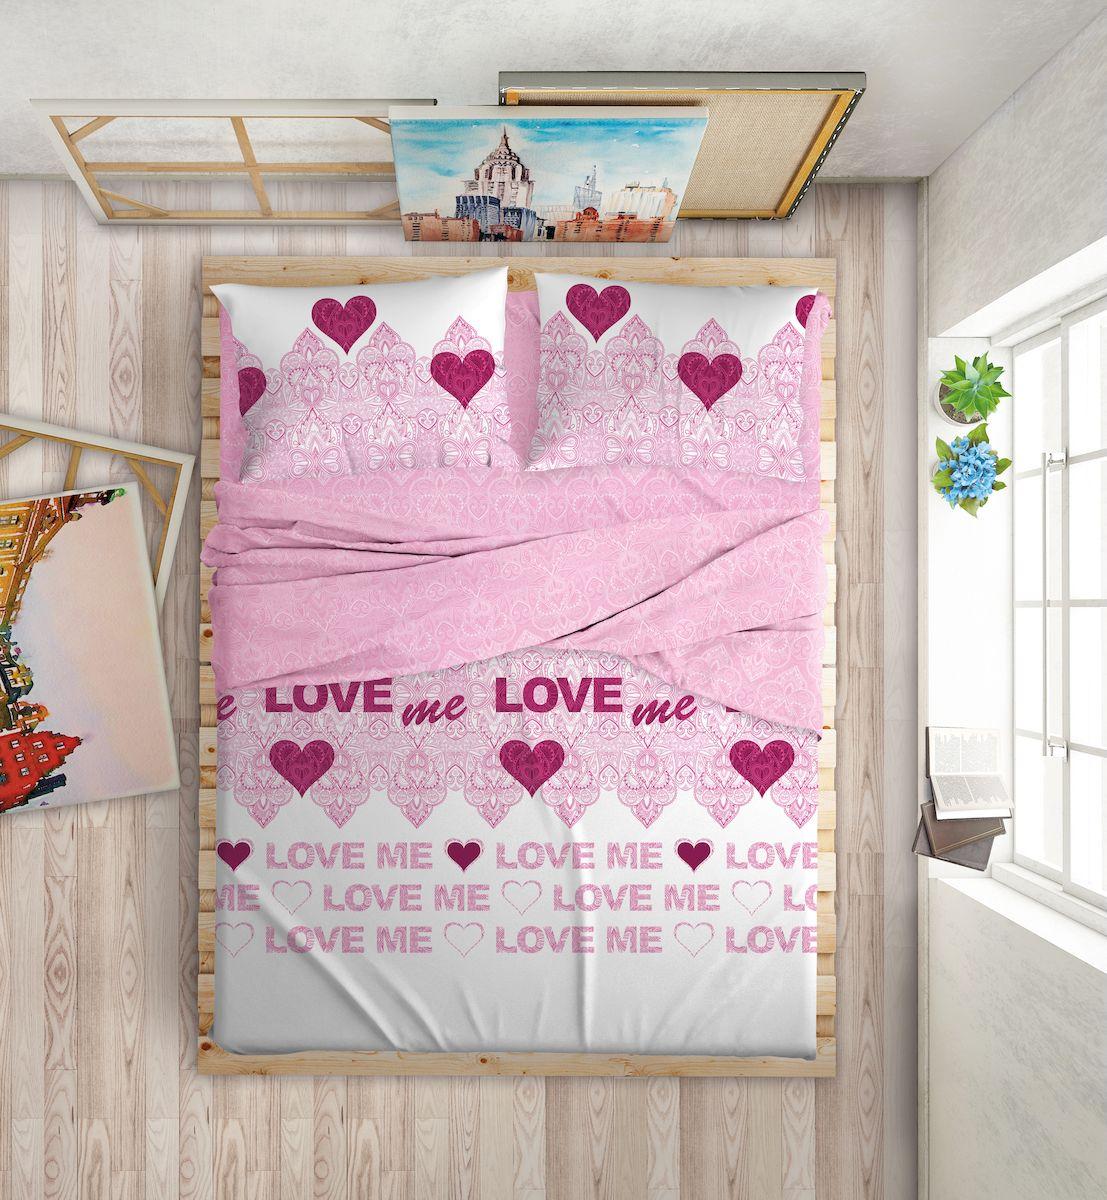 Комплект белья Love Me, 2-спальный, наволочки 50х70, 70х70, цвет: белый, розовый комплект белья love me london евро наволочки 50х70 70х70 711085